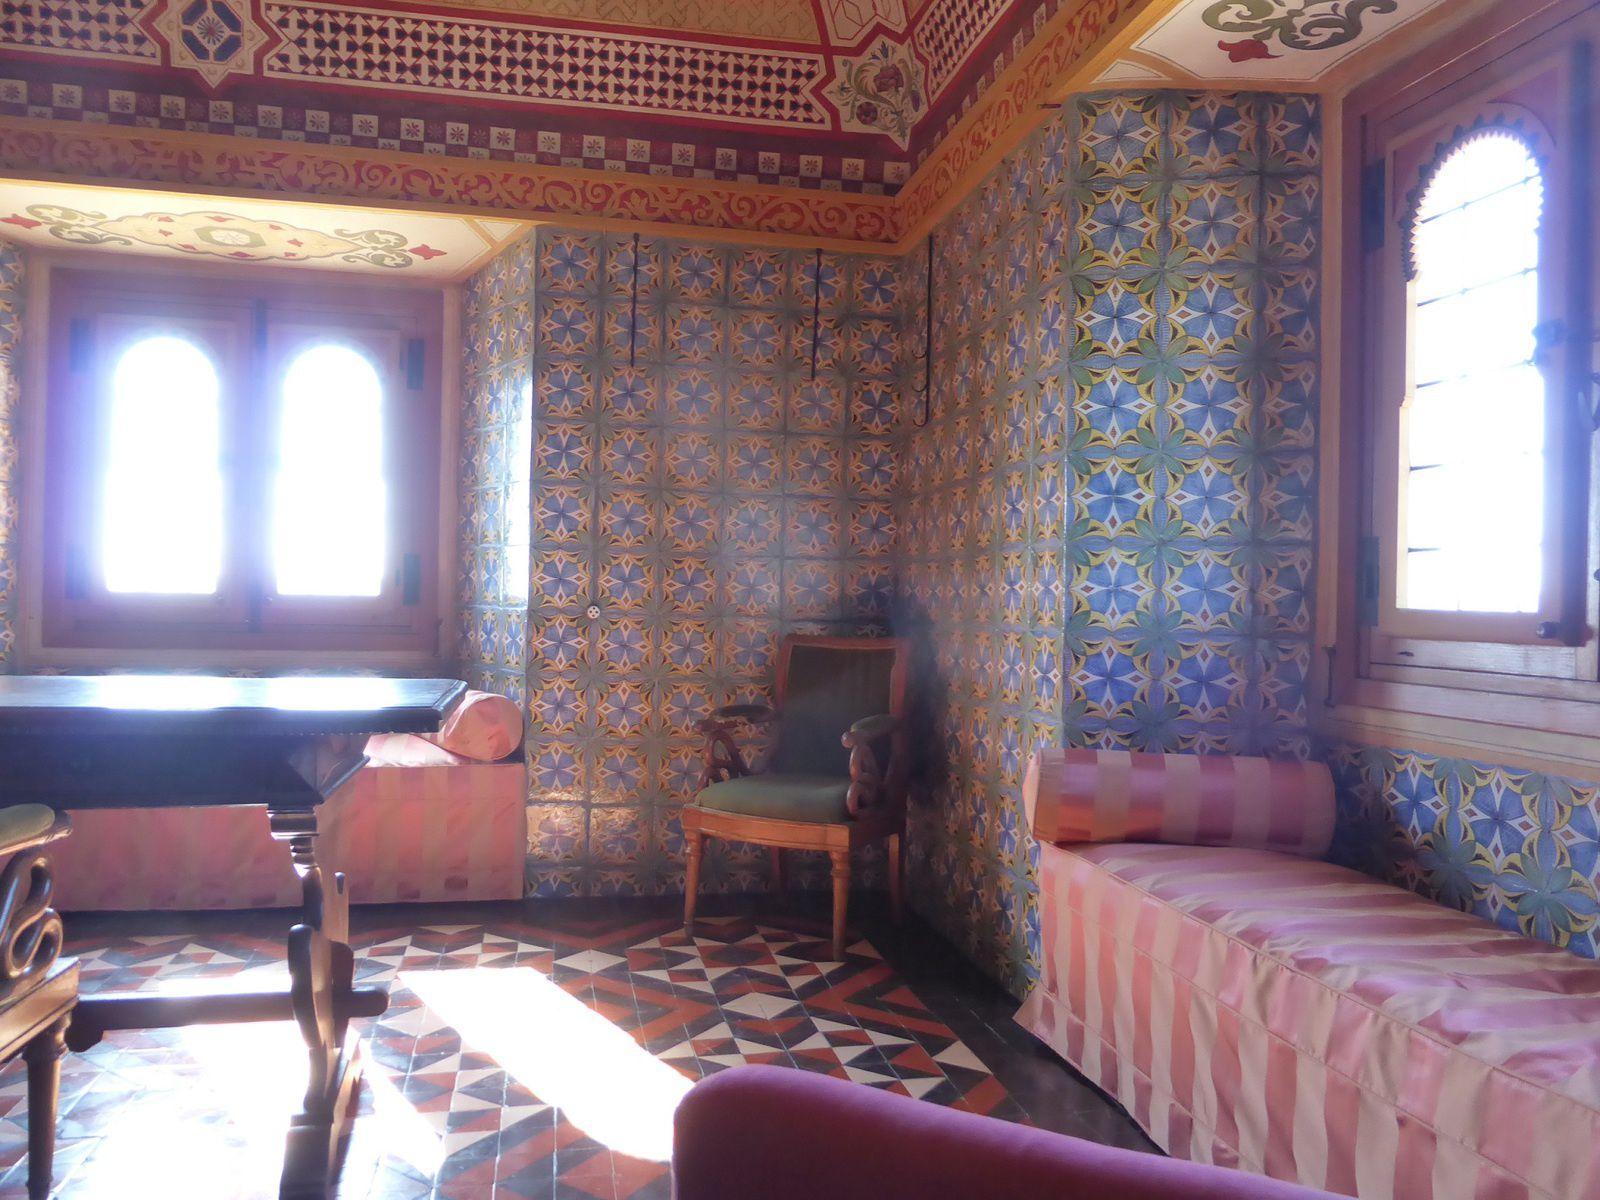 Acad mie de france villa m dicis rome rapport d for Balthus la chambre